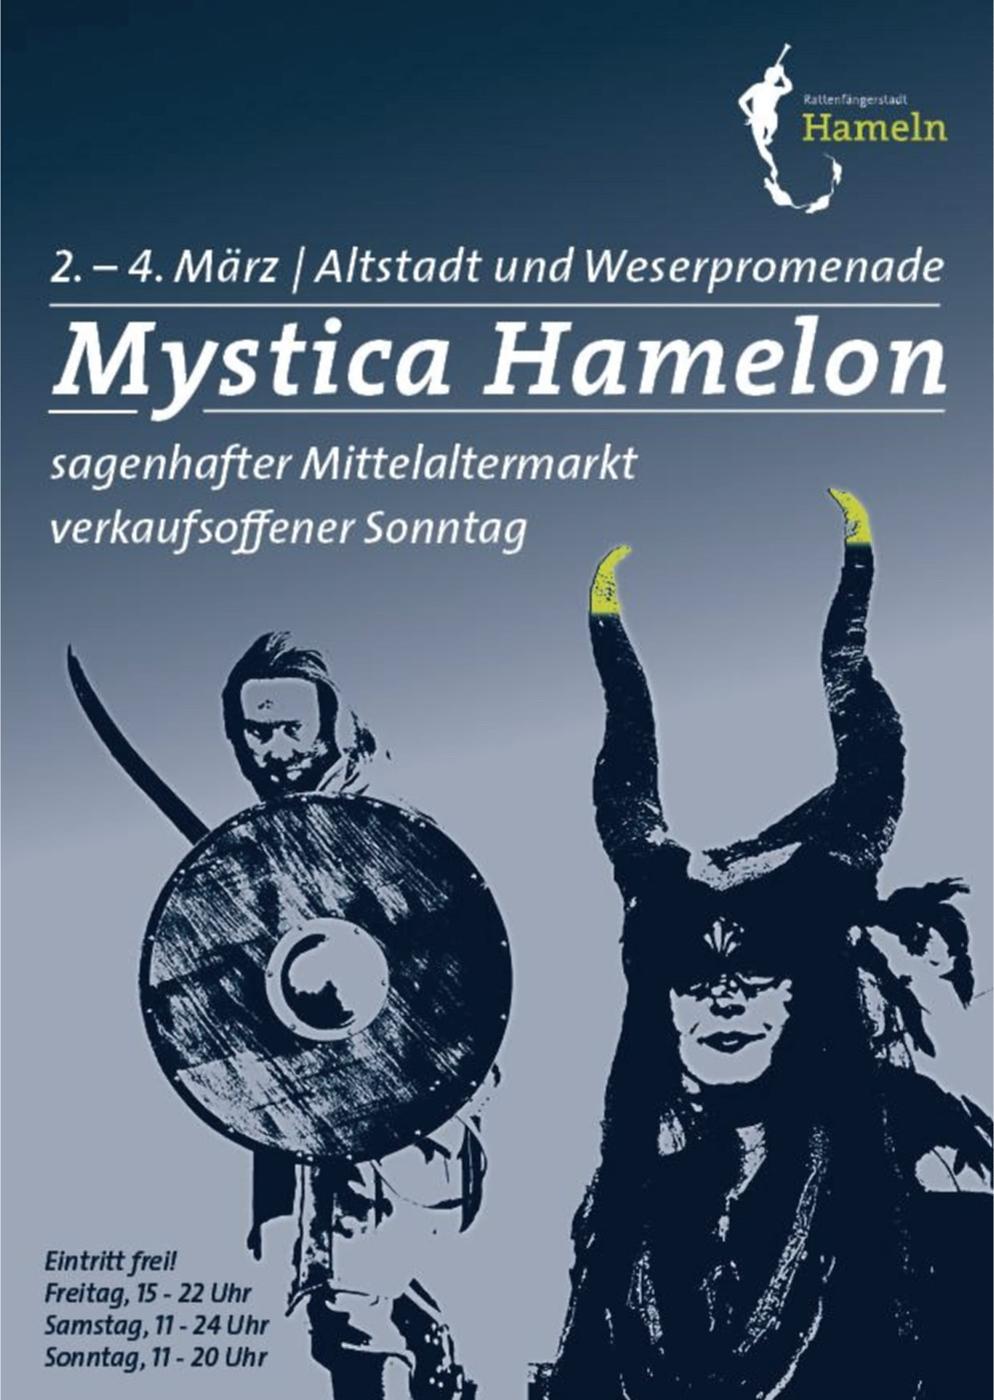 Plakat Mystica Hamelon